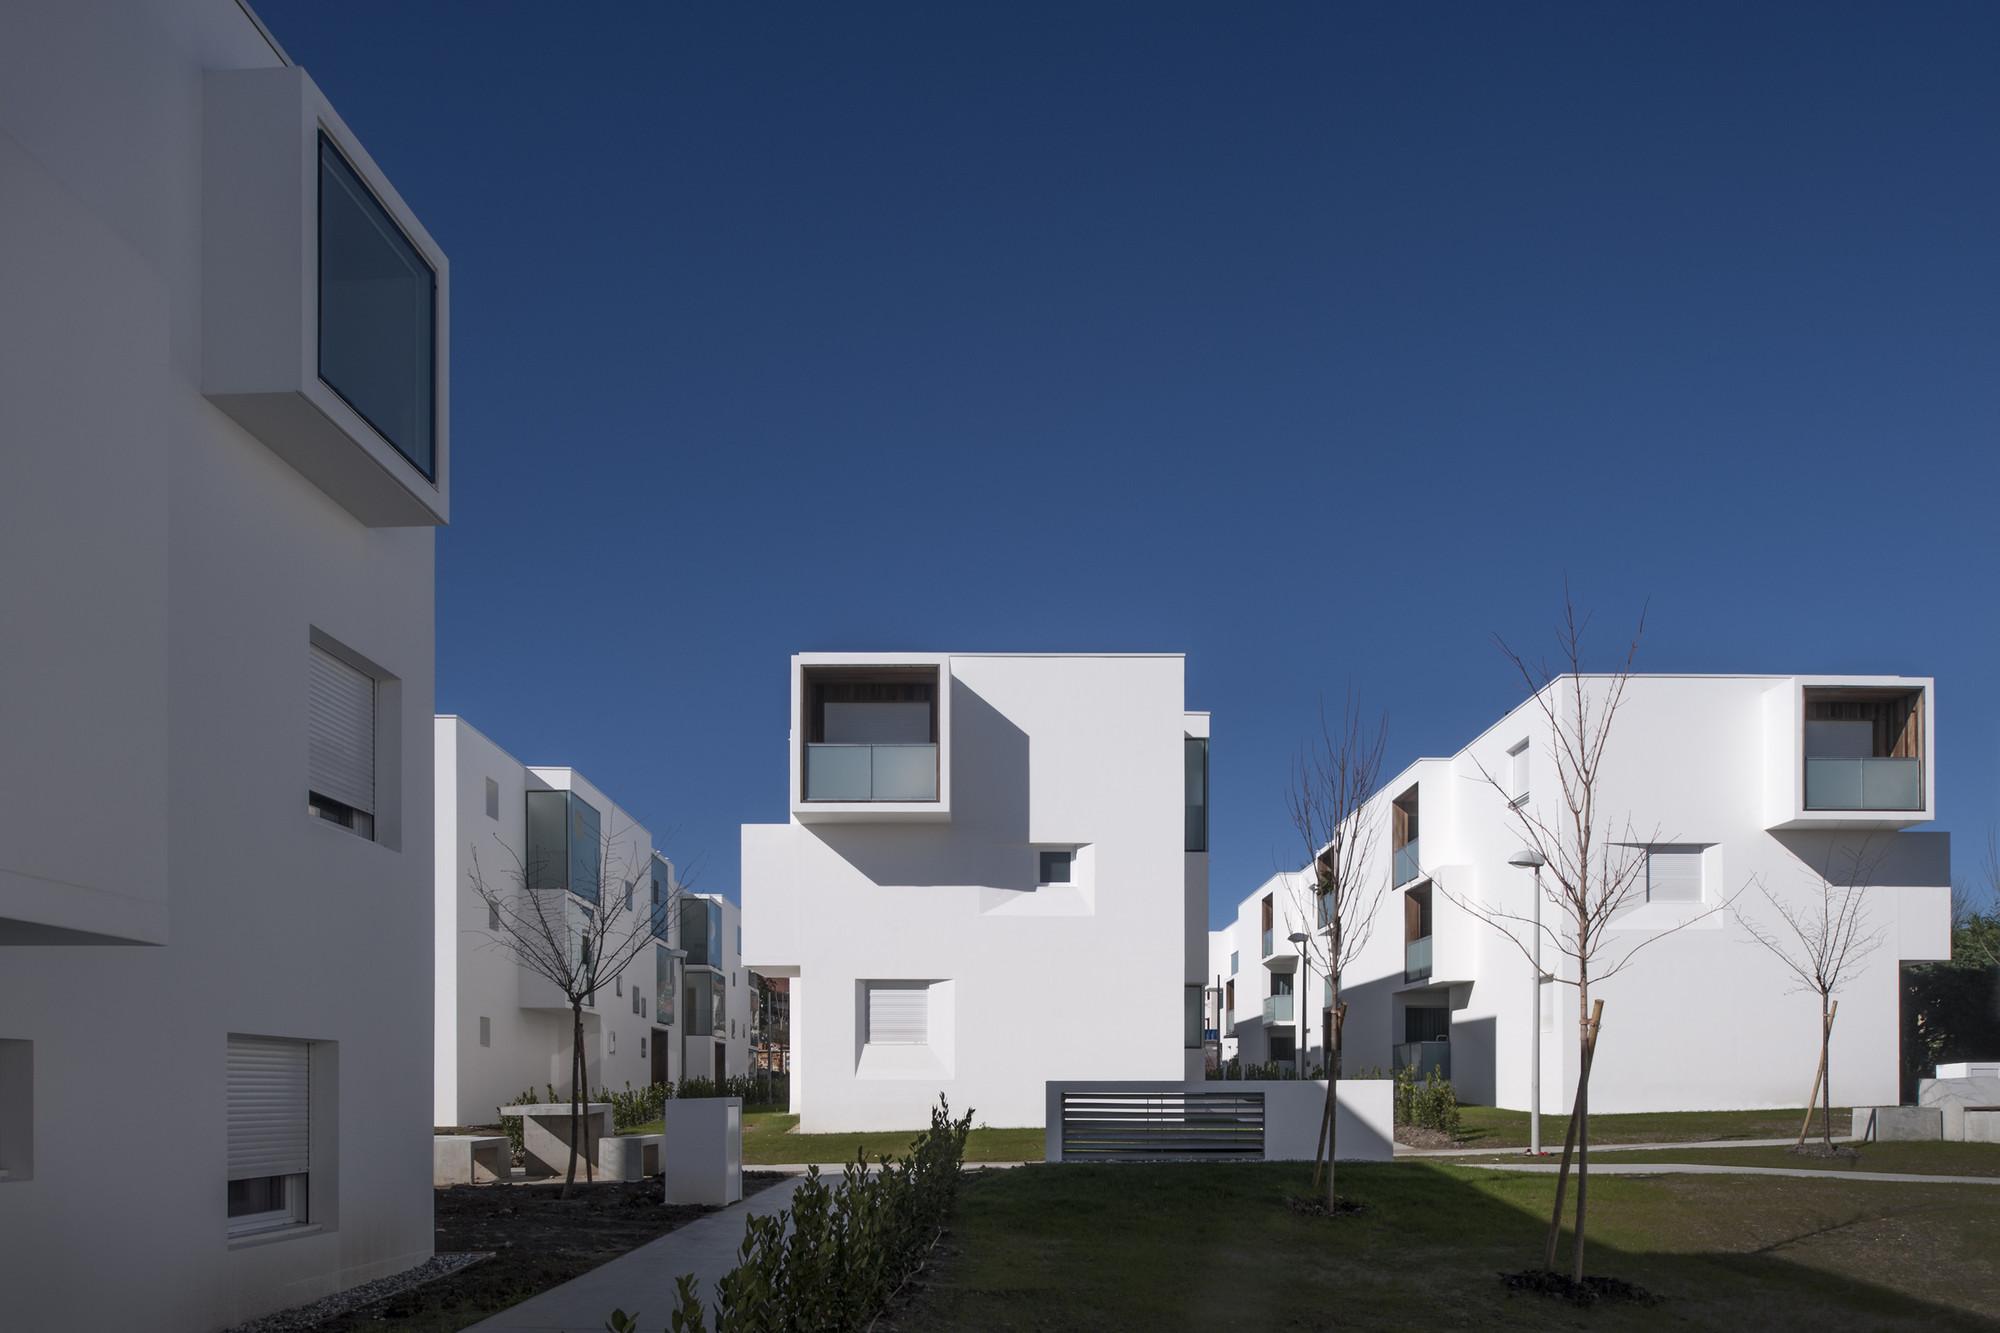 Résidence Jouanicot - Truillet / Leibar Seigneurin Architectes, © Patrick Miara